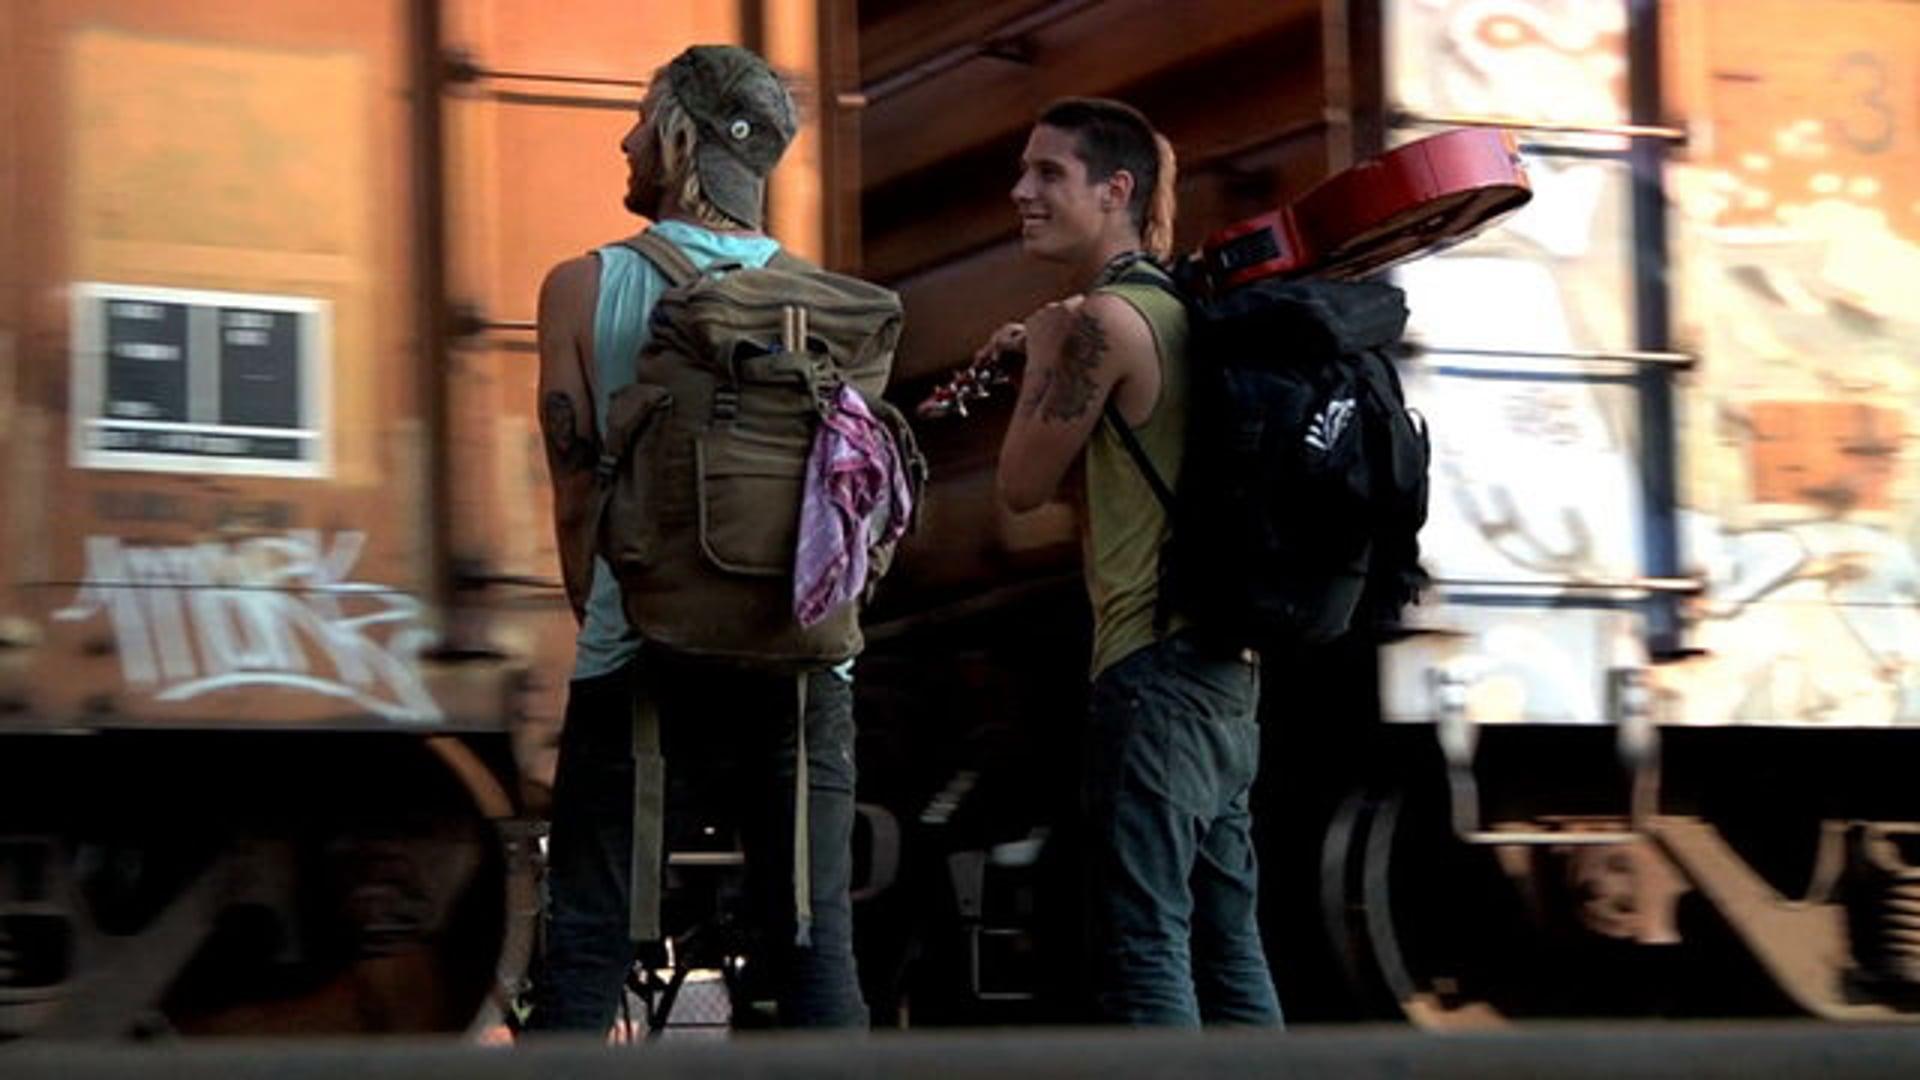 Freedom Junkies: a short documentary by chris hilleke